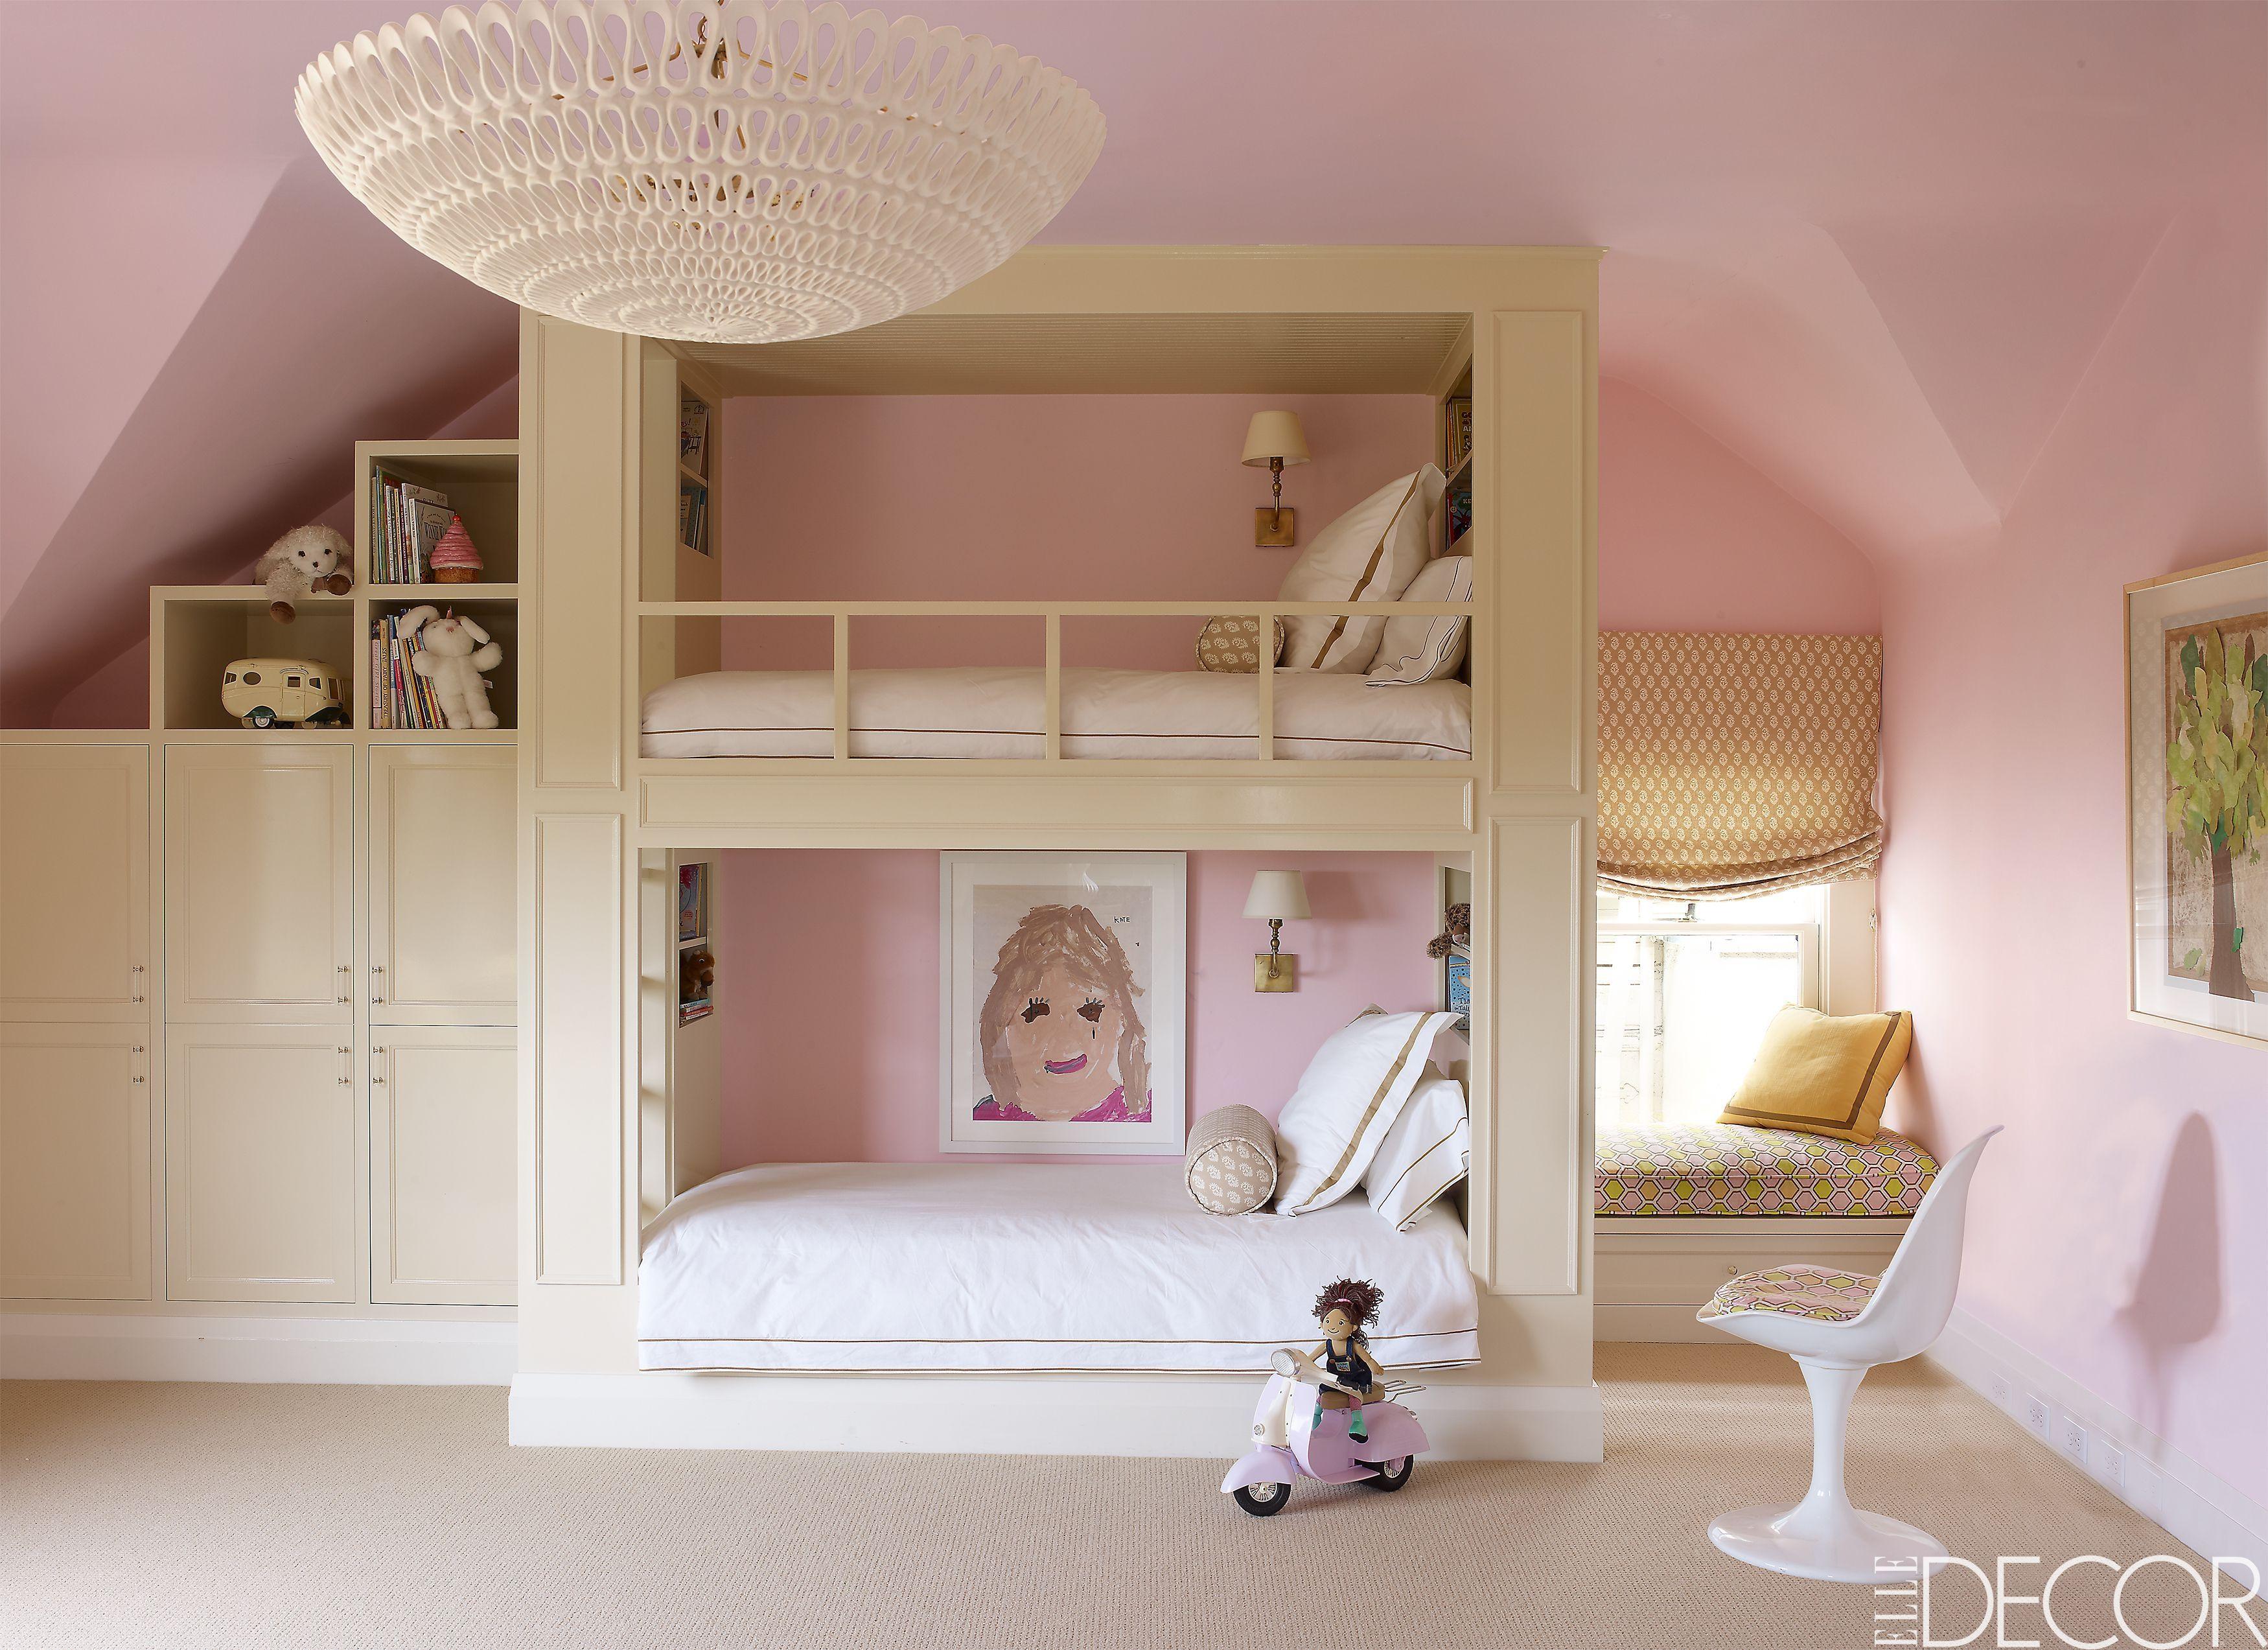 Girls bedroom decorating ideas creative girls room decor tips